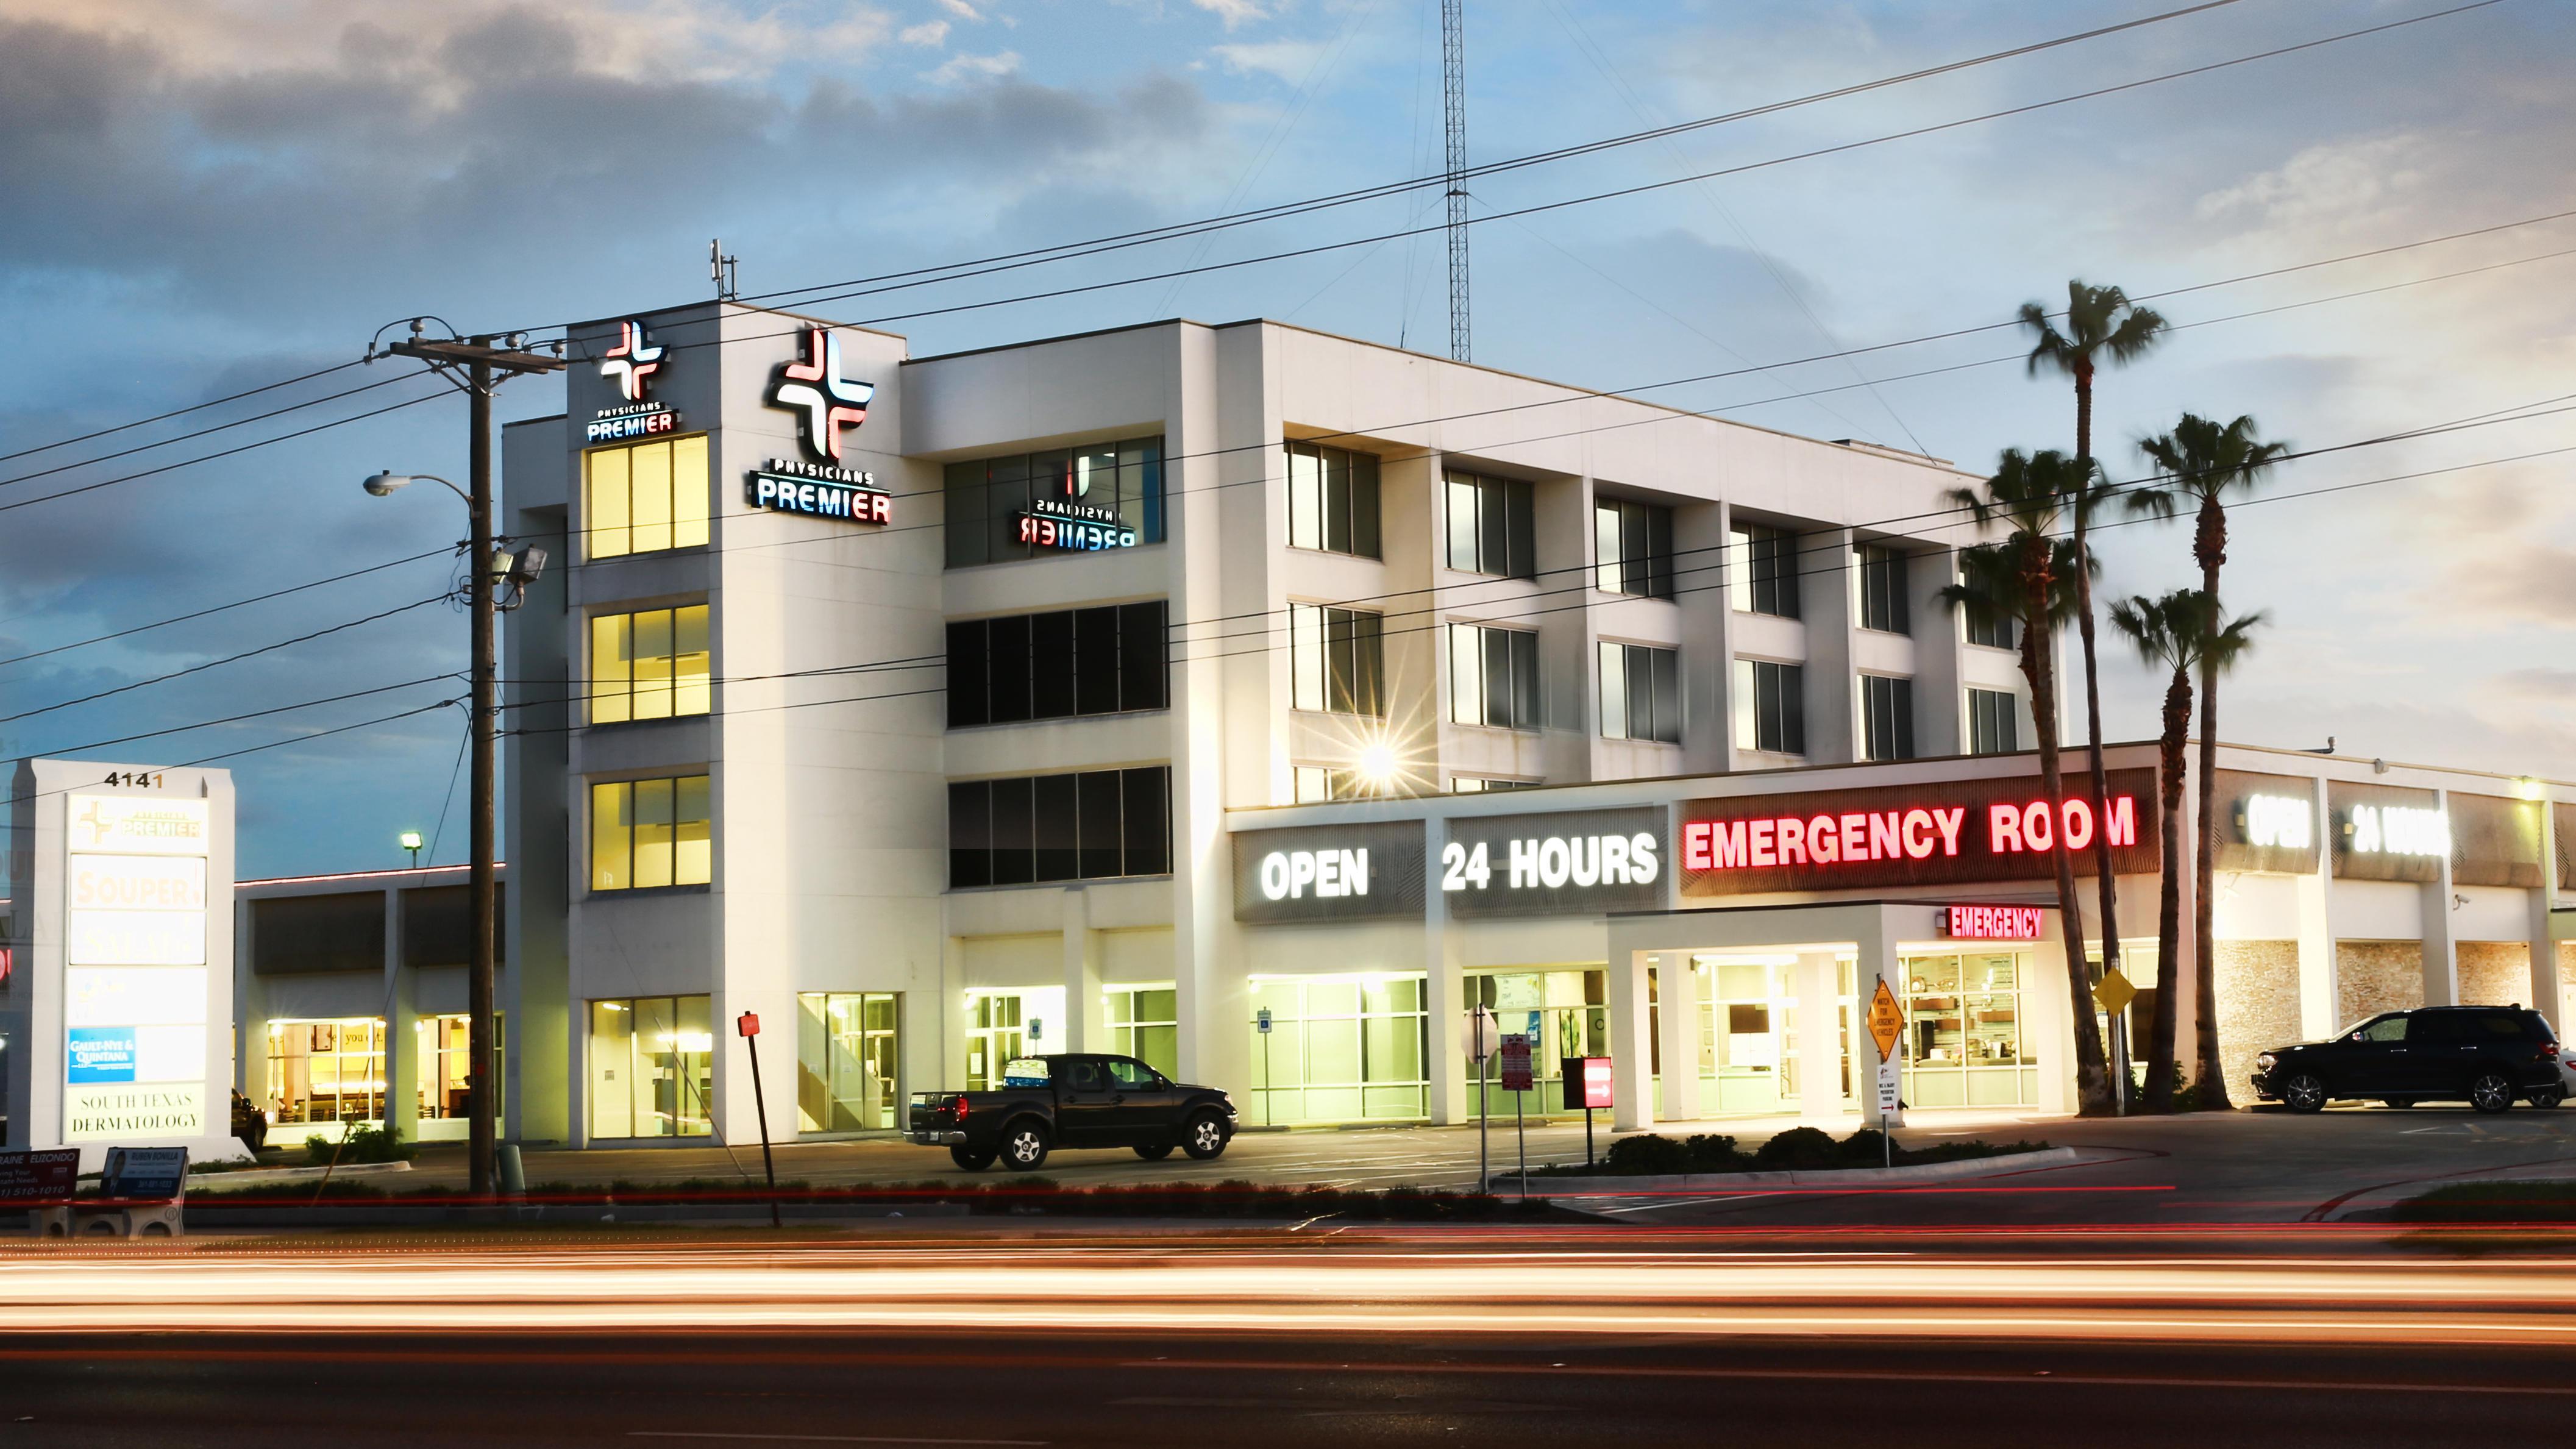 Physicians Premier Emergency Room - Everhart image 0